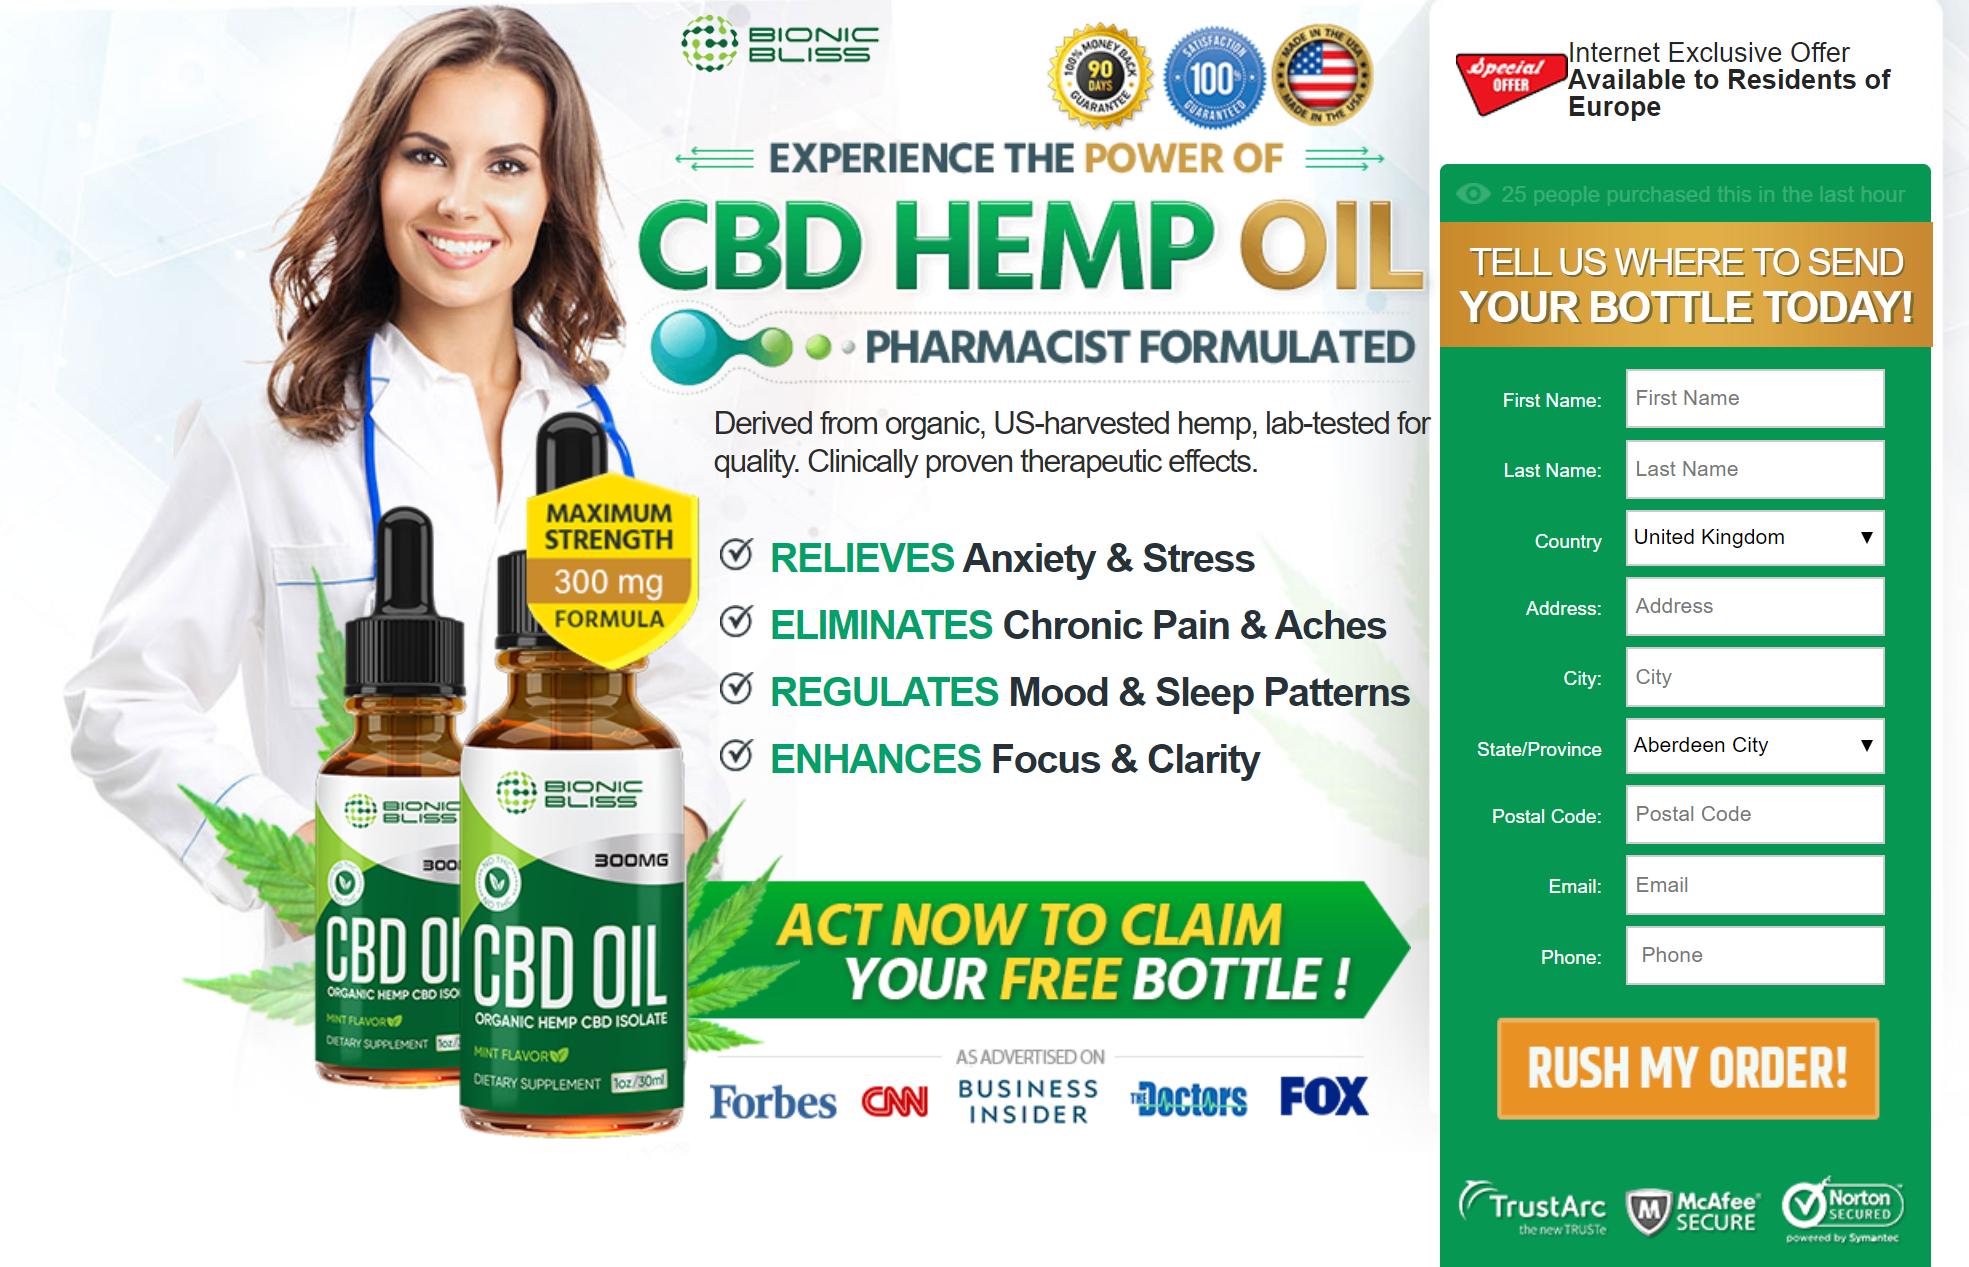 Bionic Bliss Organic CBD Oil